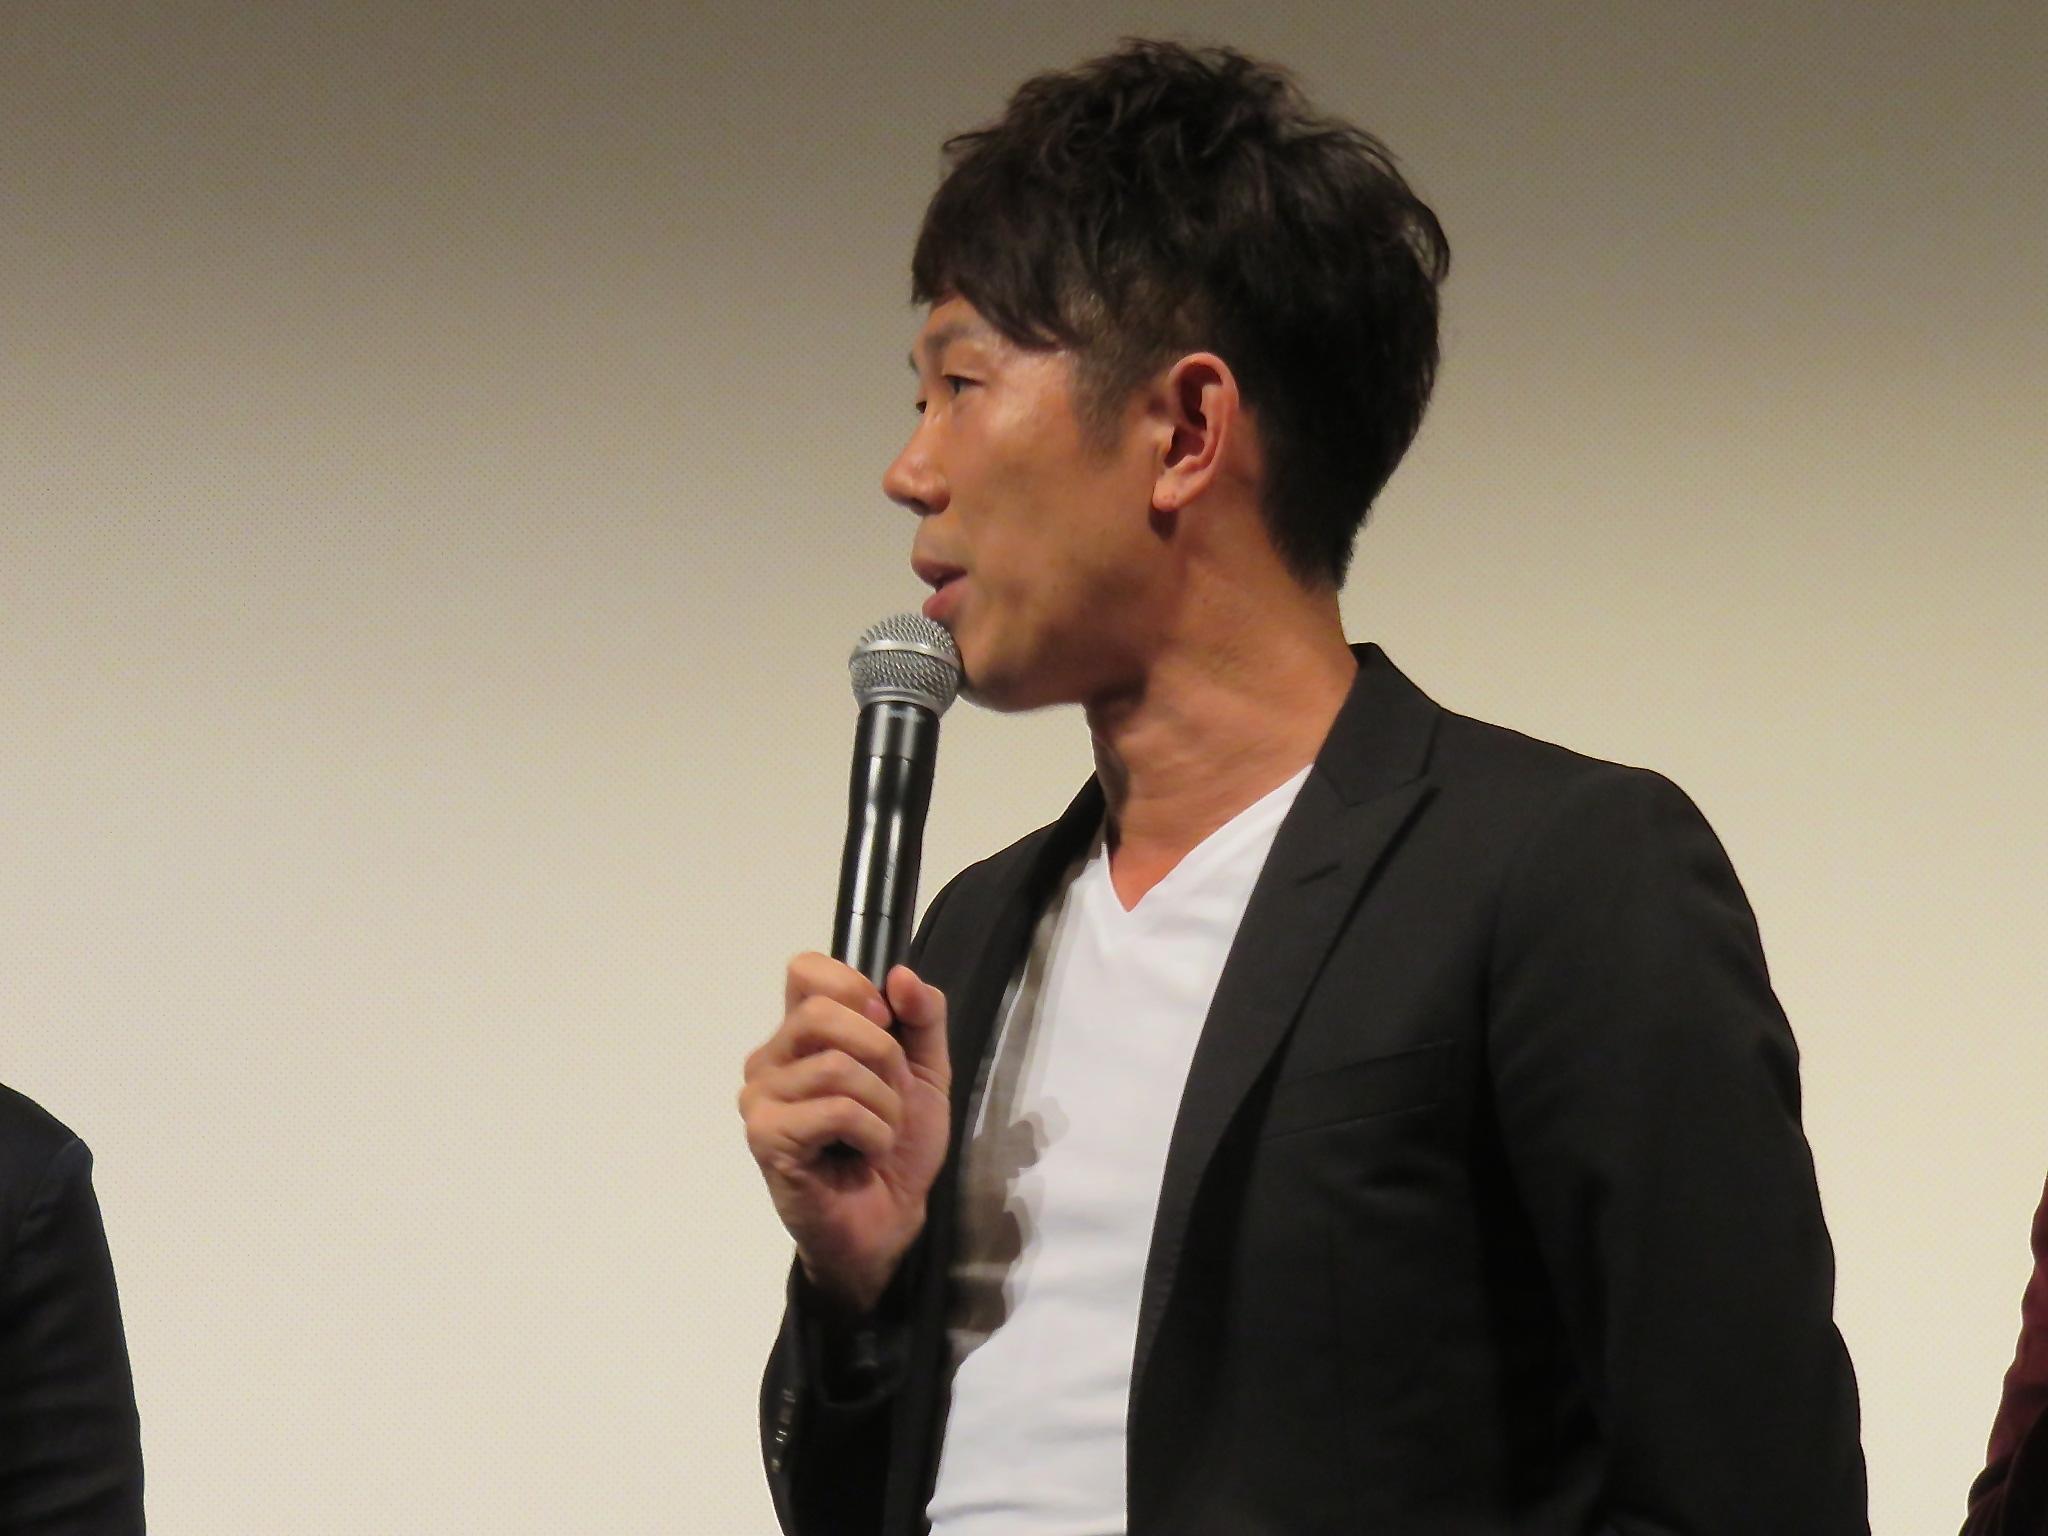 http://news.yoshimoto.co.jp/20171010201307-0f8662a733b884d19d76e799668c7ccb92856546.jpg